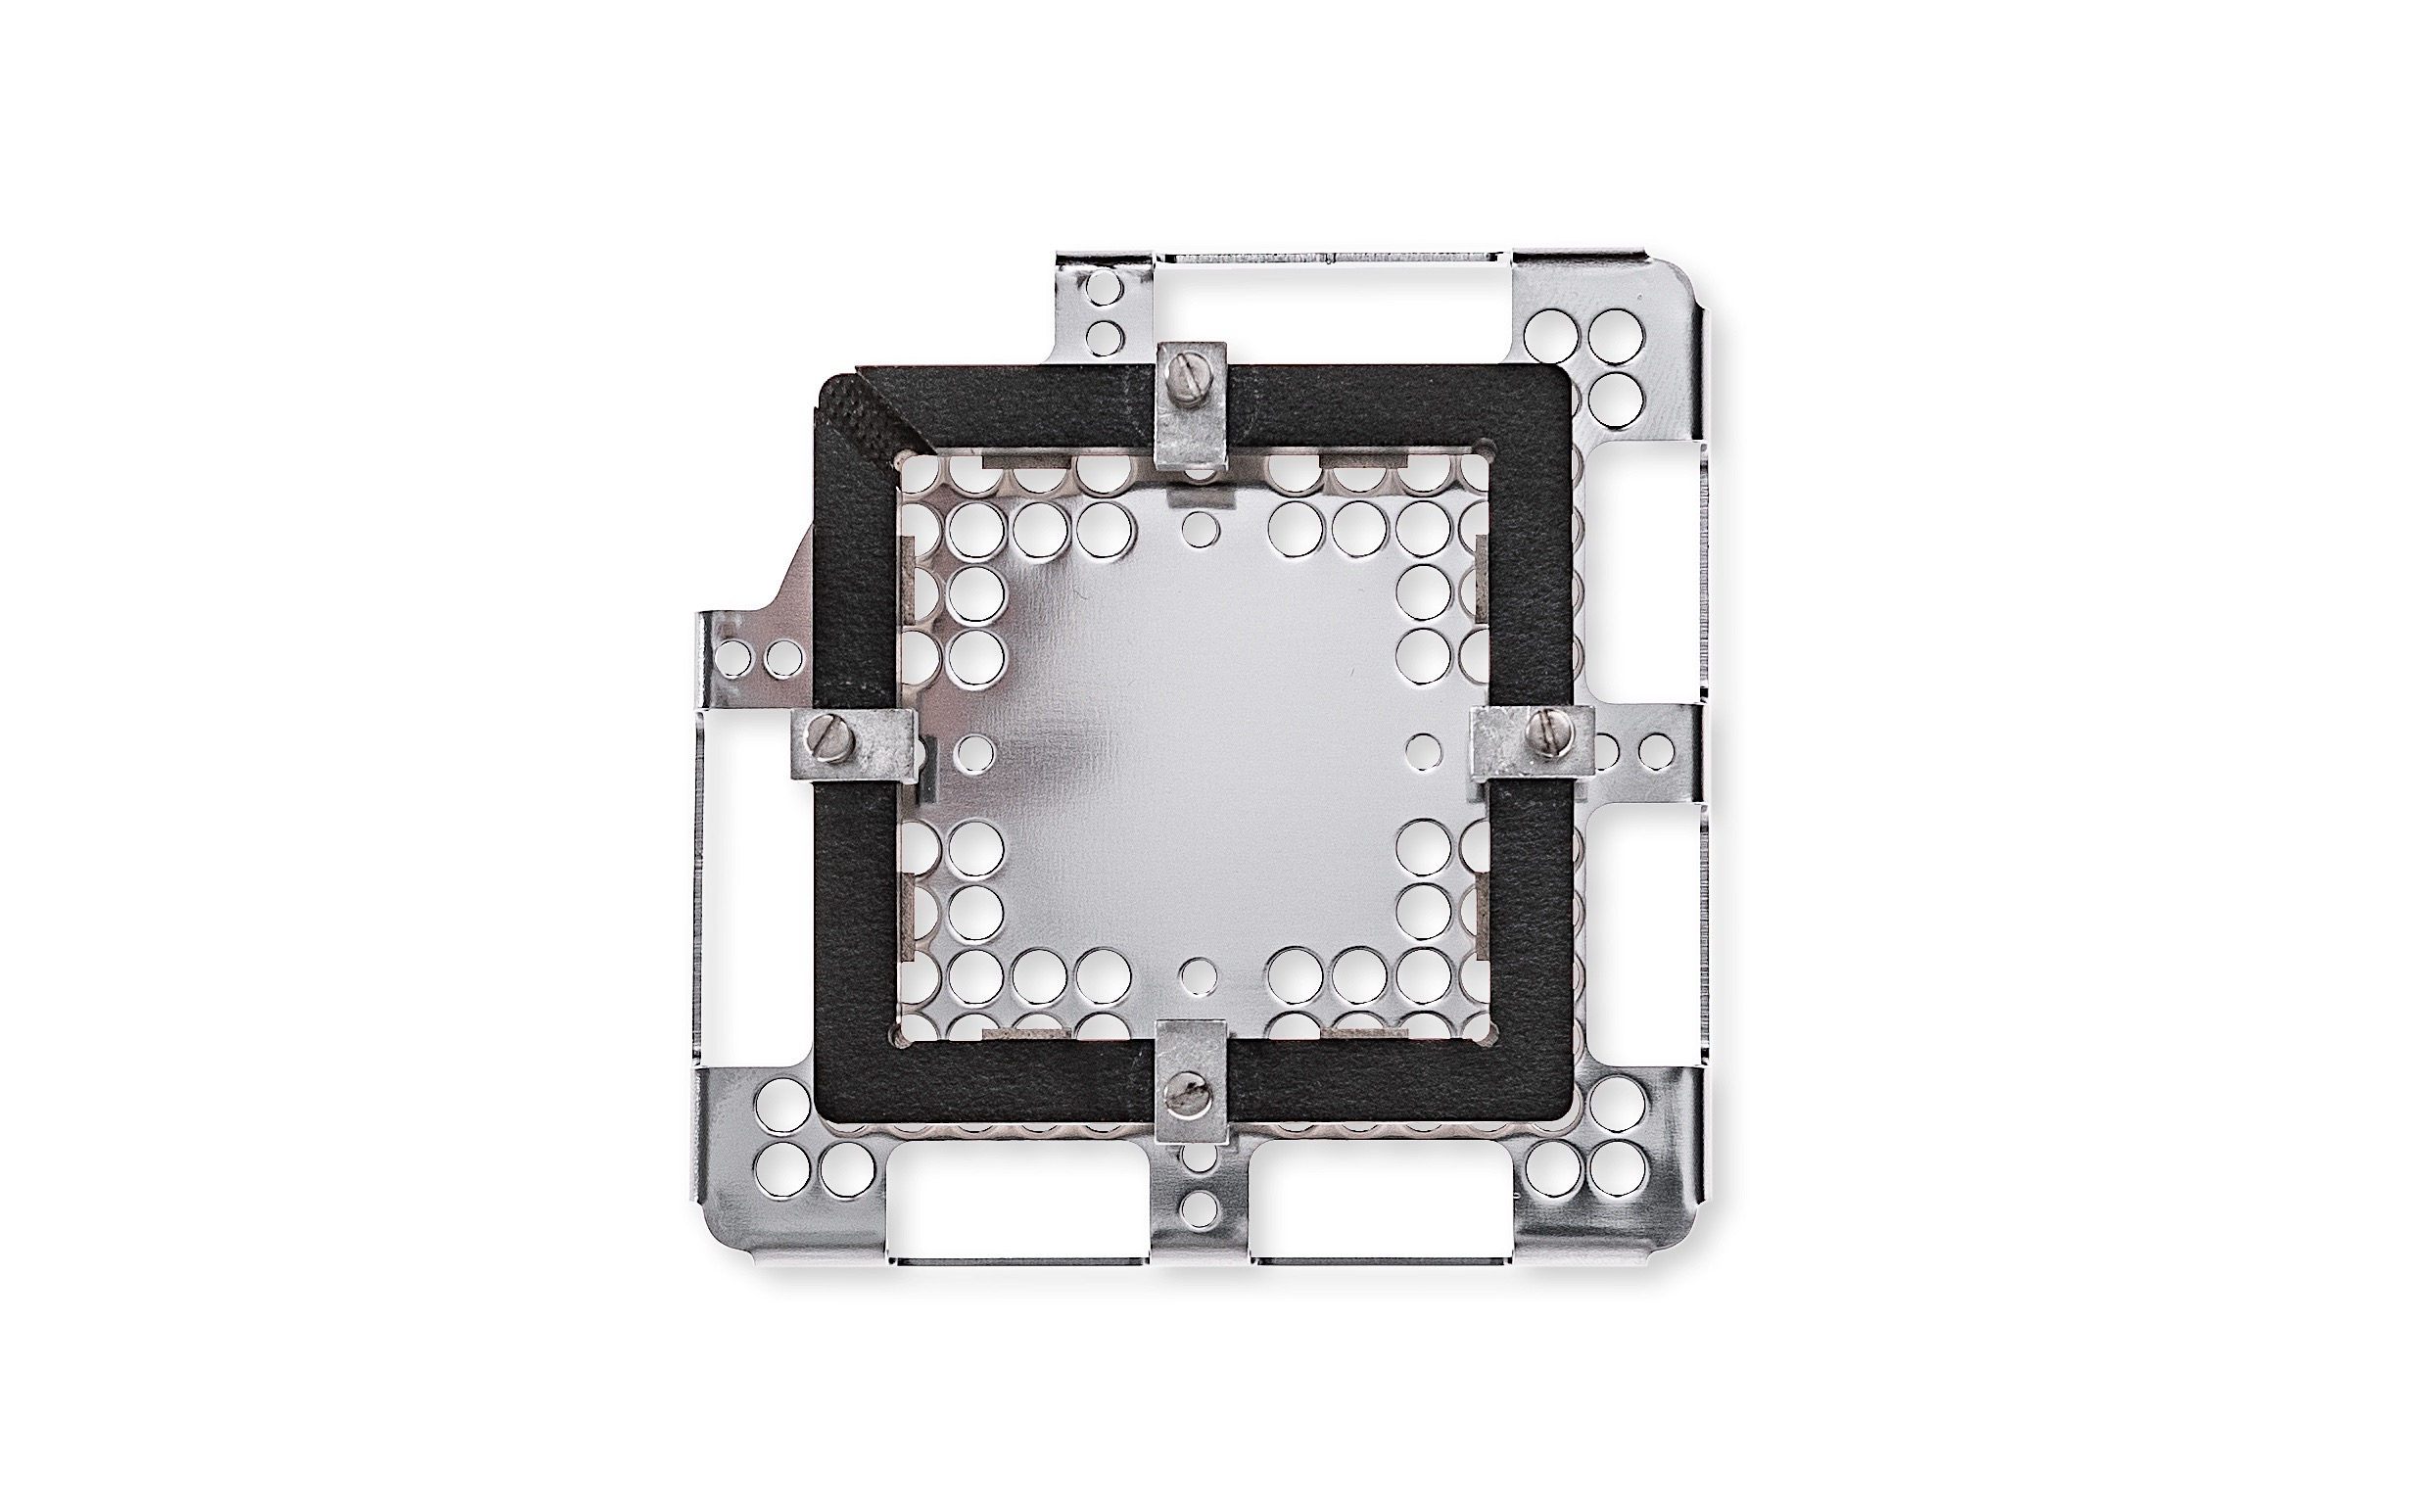 Reballing-Halter BGA 45*45mm  eco